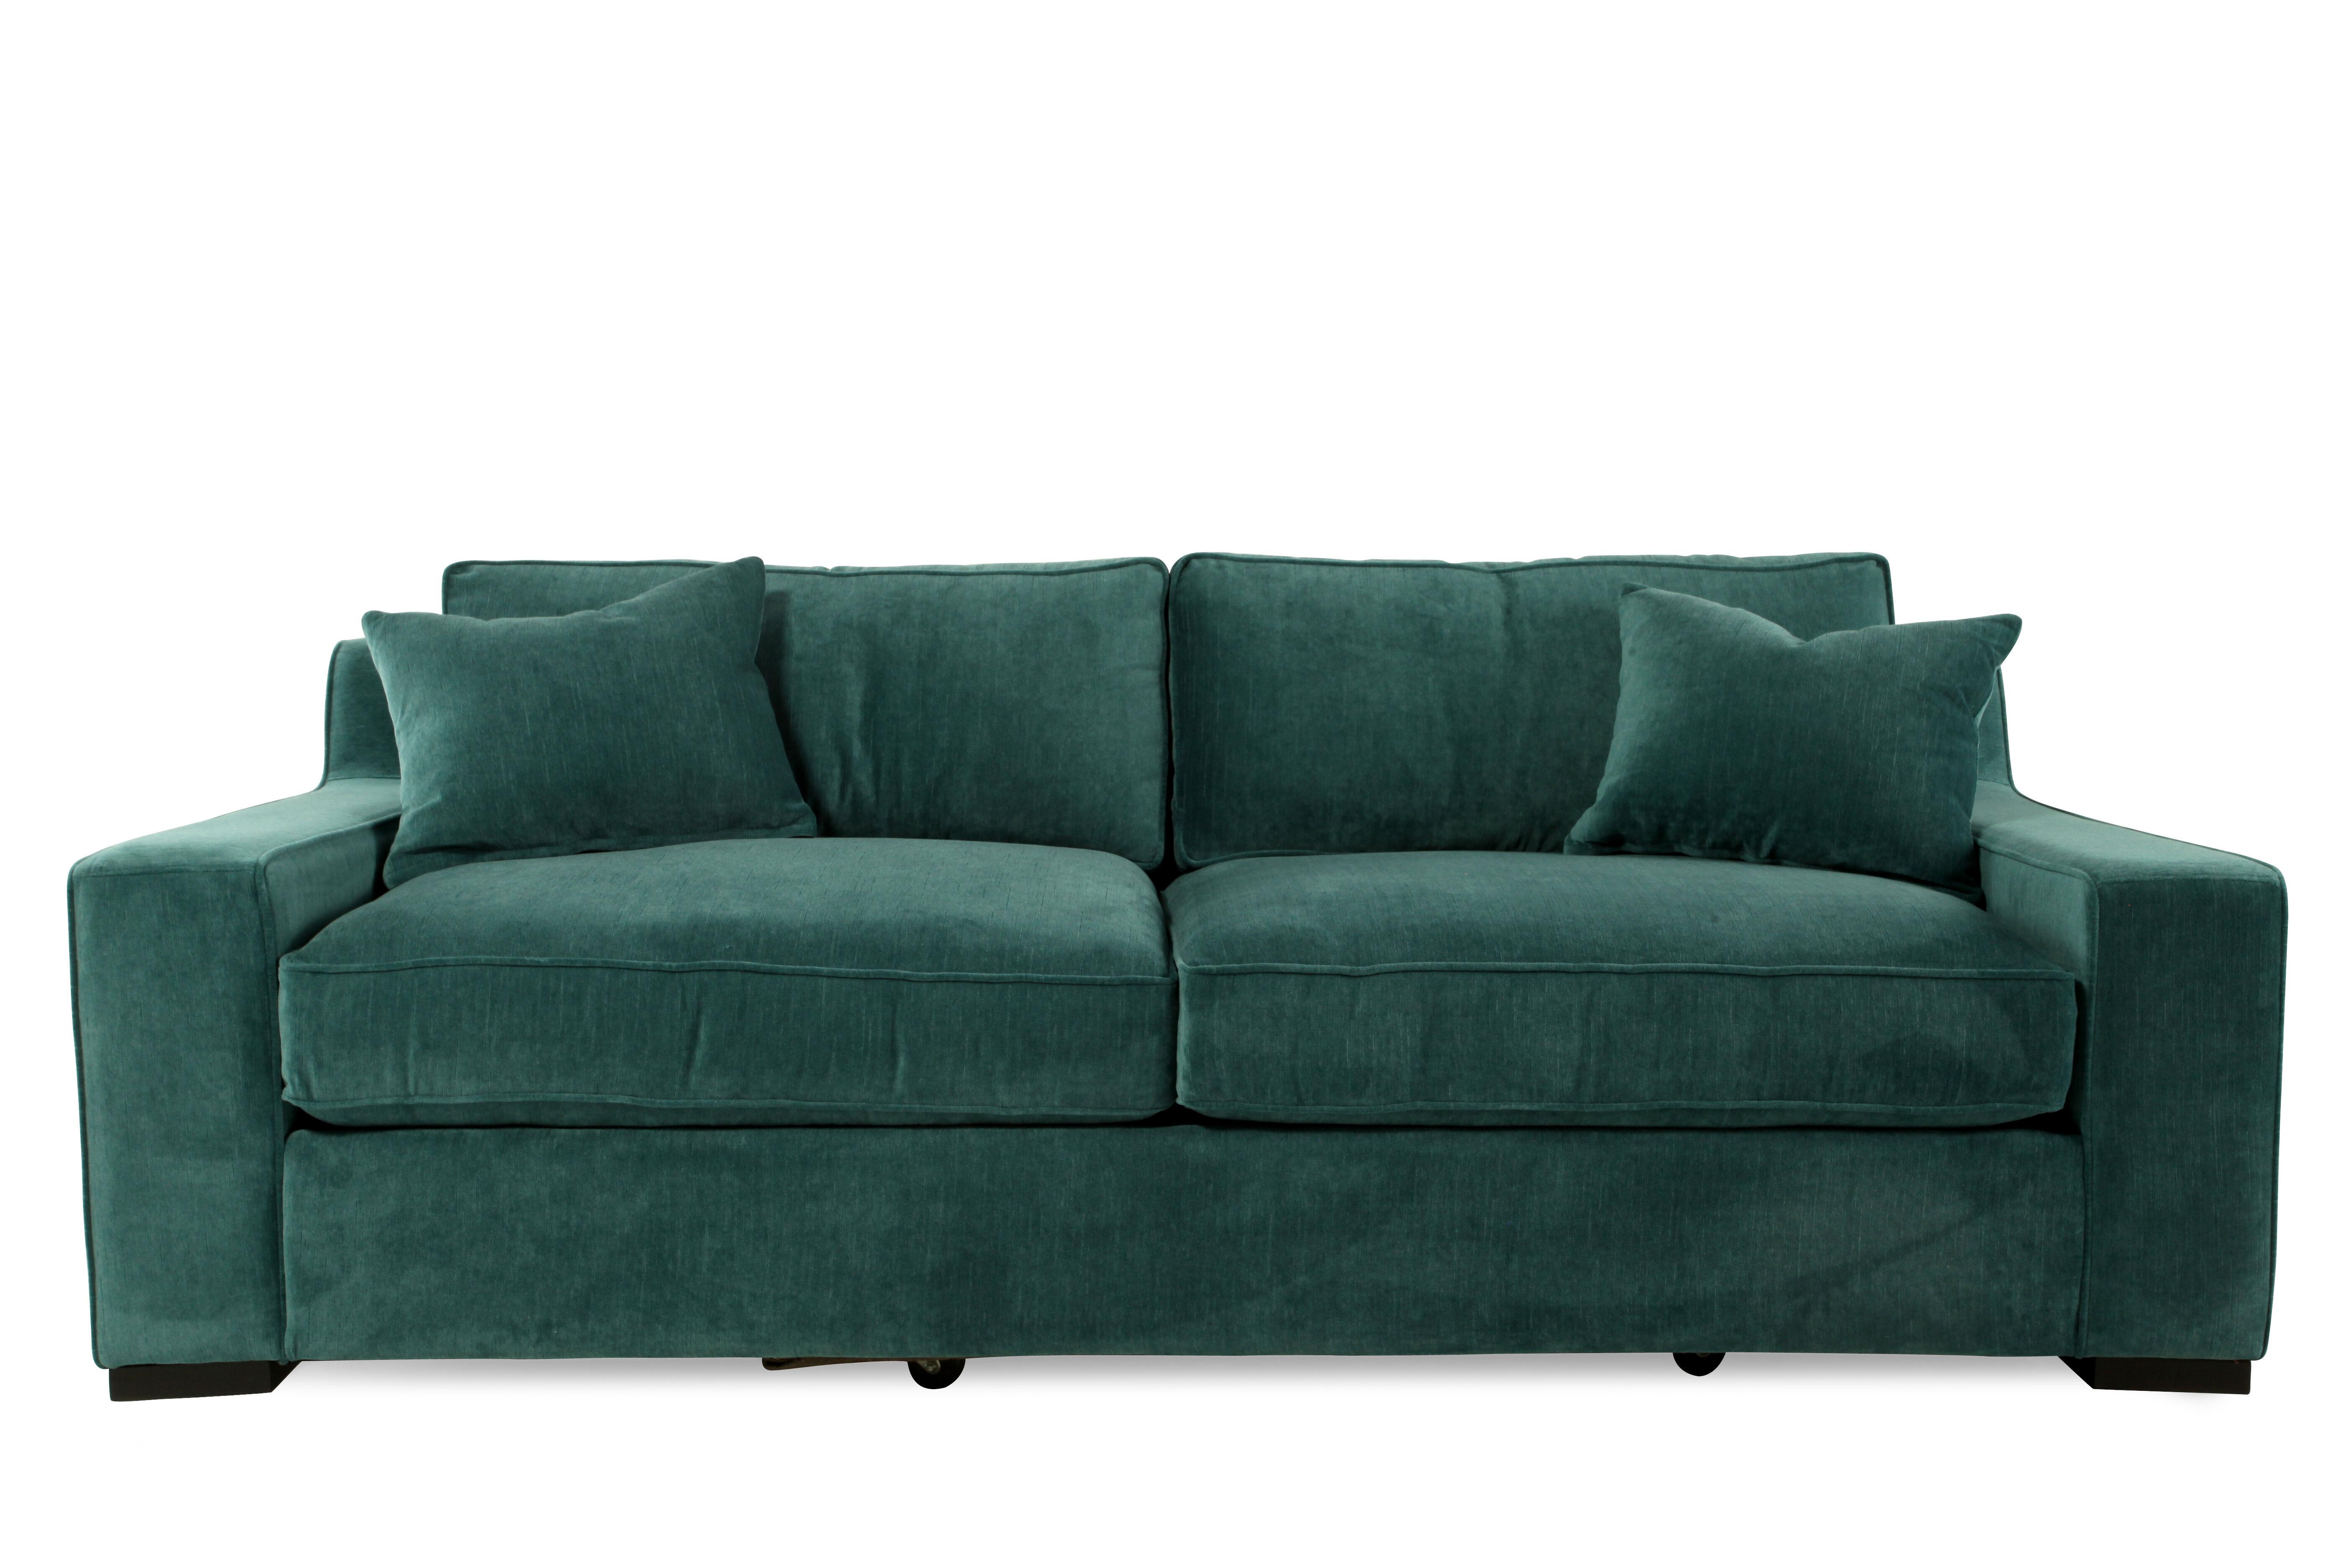 Images Low Profile Microfiber 38u0026quot; Sofa In Emerald Green